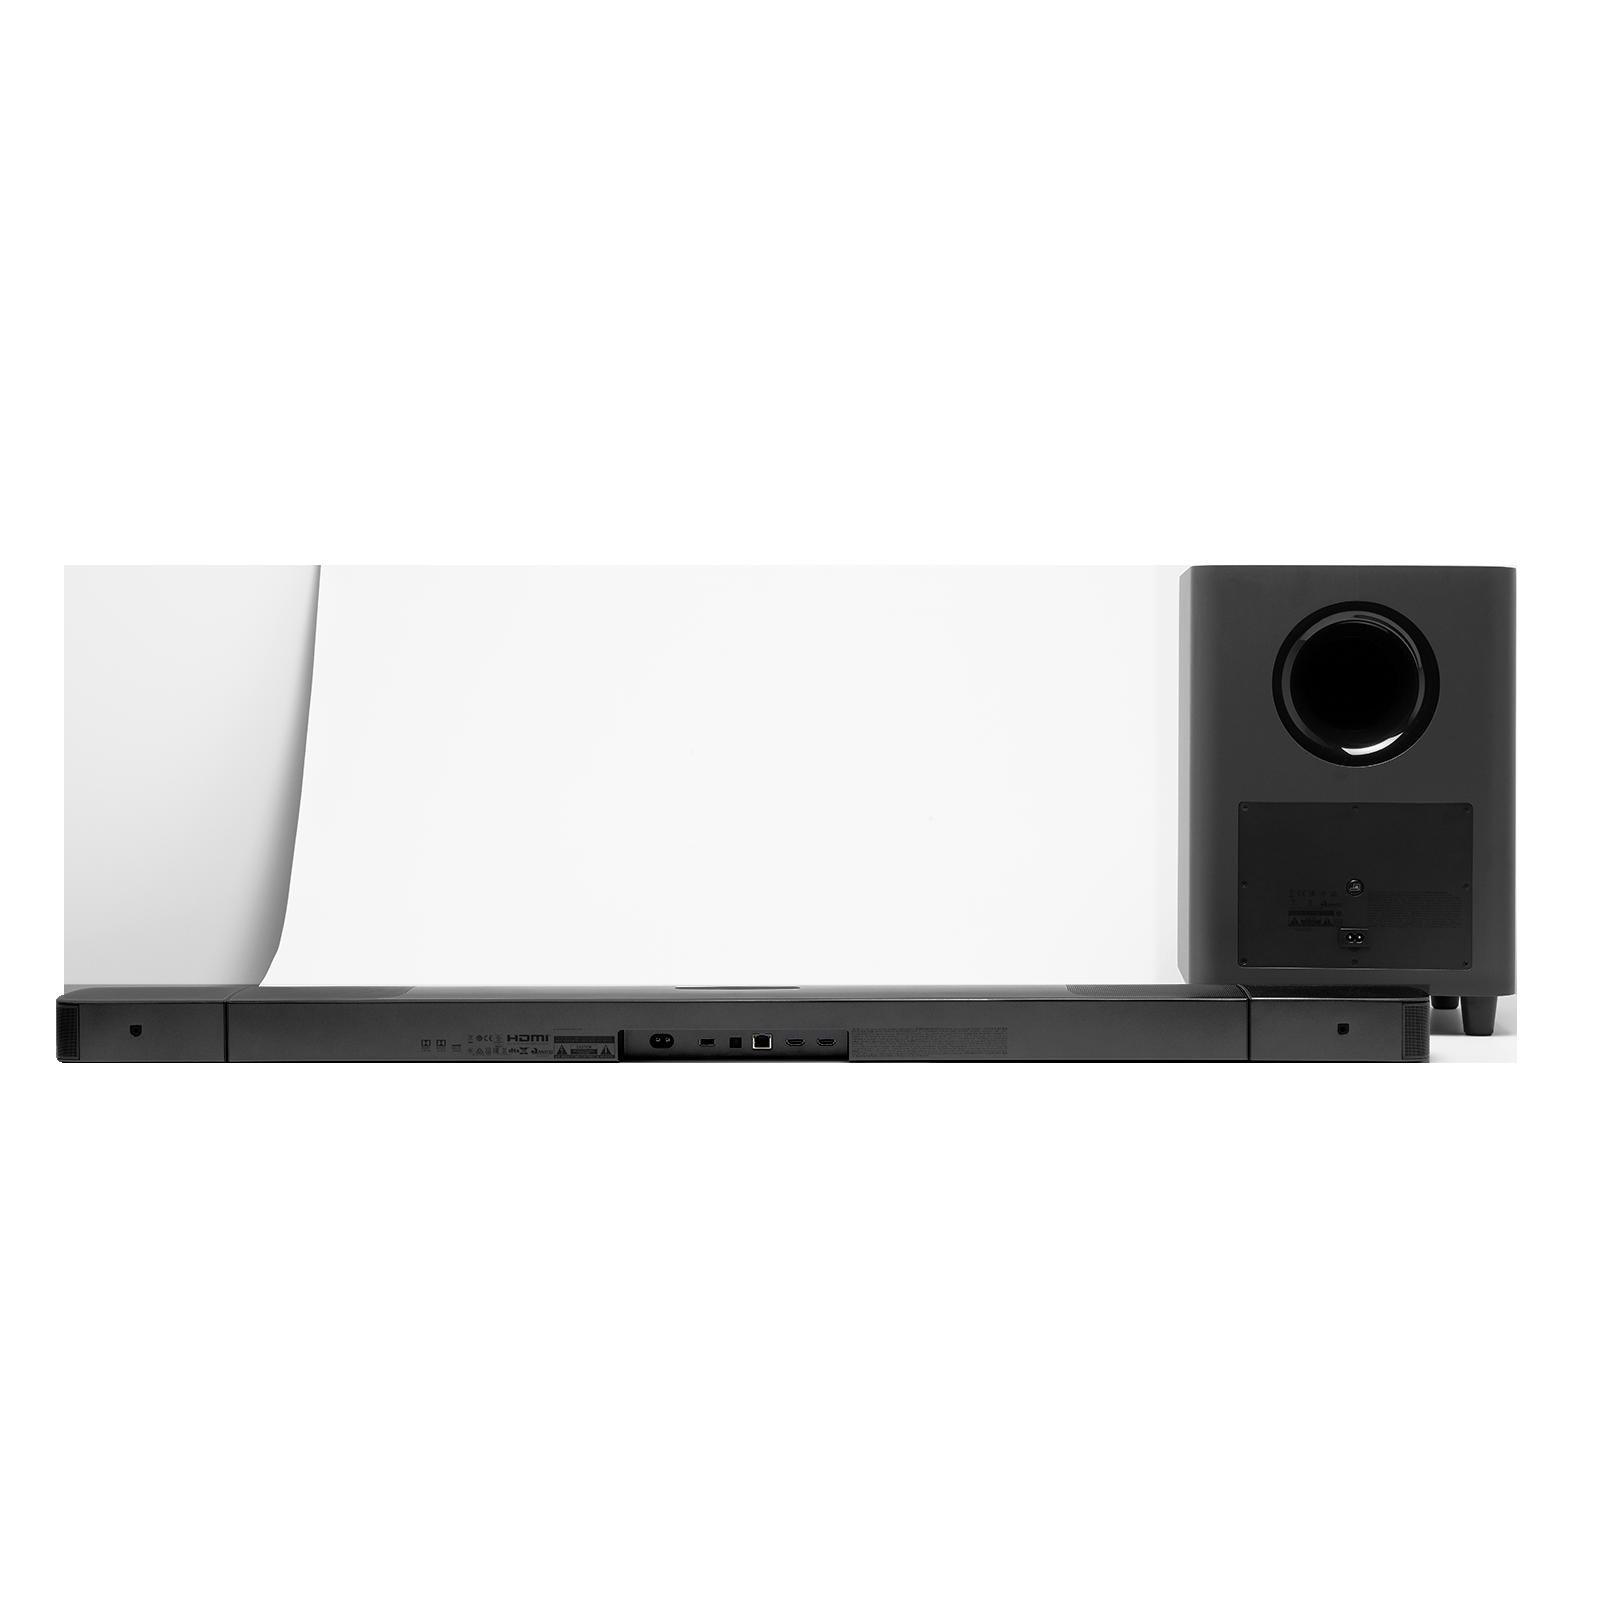 JBL BAR 9.1 True Wireless Surround with Dolby Atmos® - Black - Detailshot 4